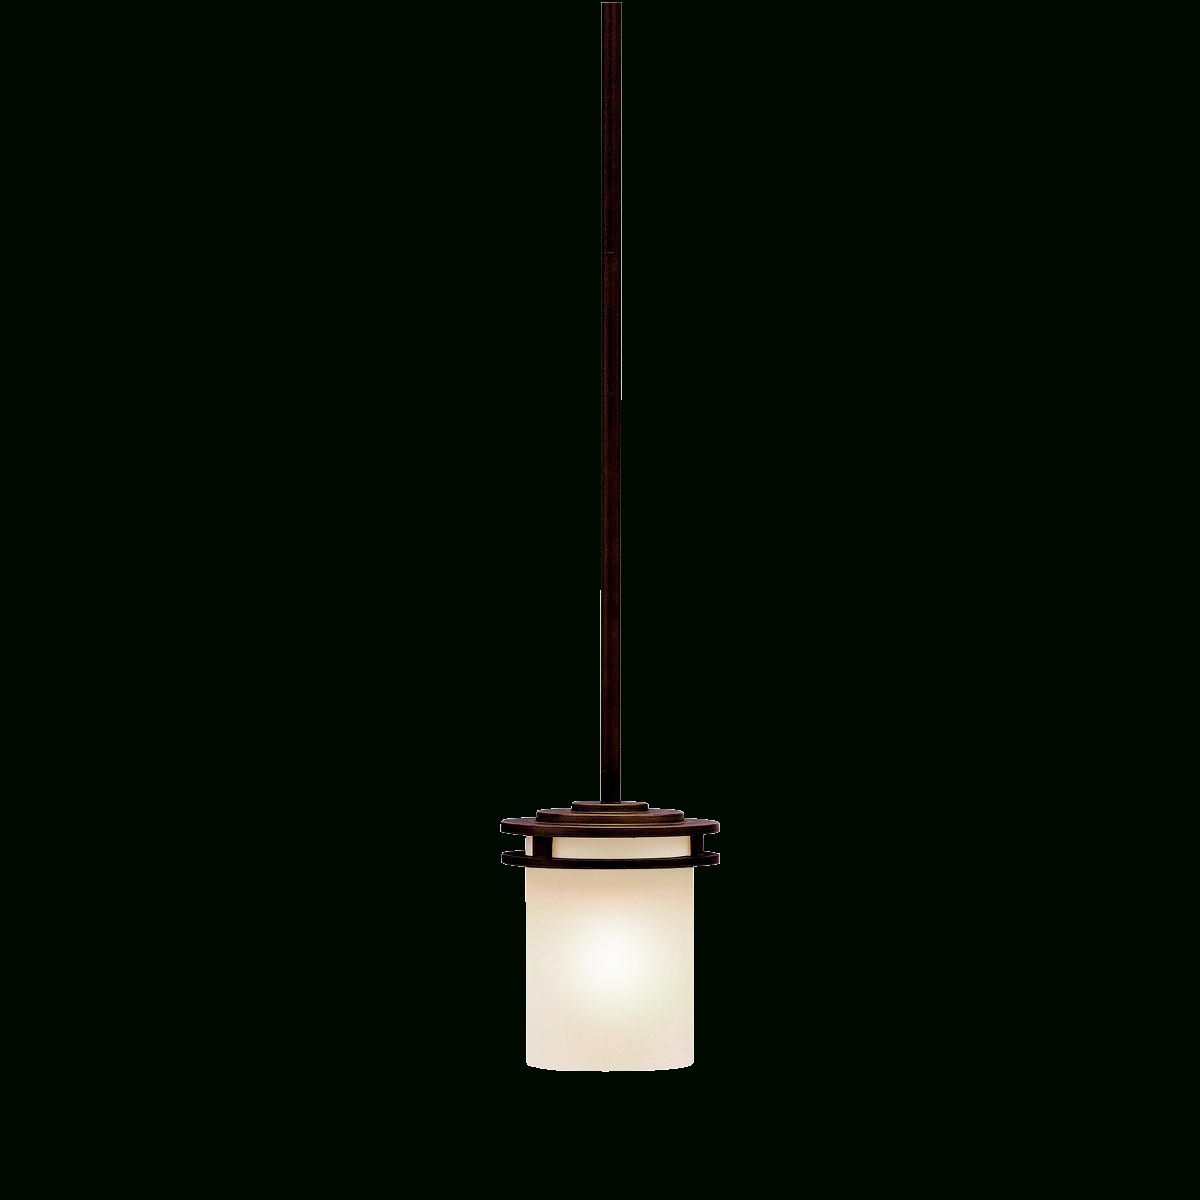 Transitional 1 Light Mini Pendant In Brushed Nickel – Hendrik Within Kichler Mini Pendant Lights (View 5 of 15)